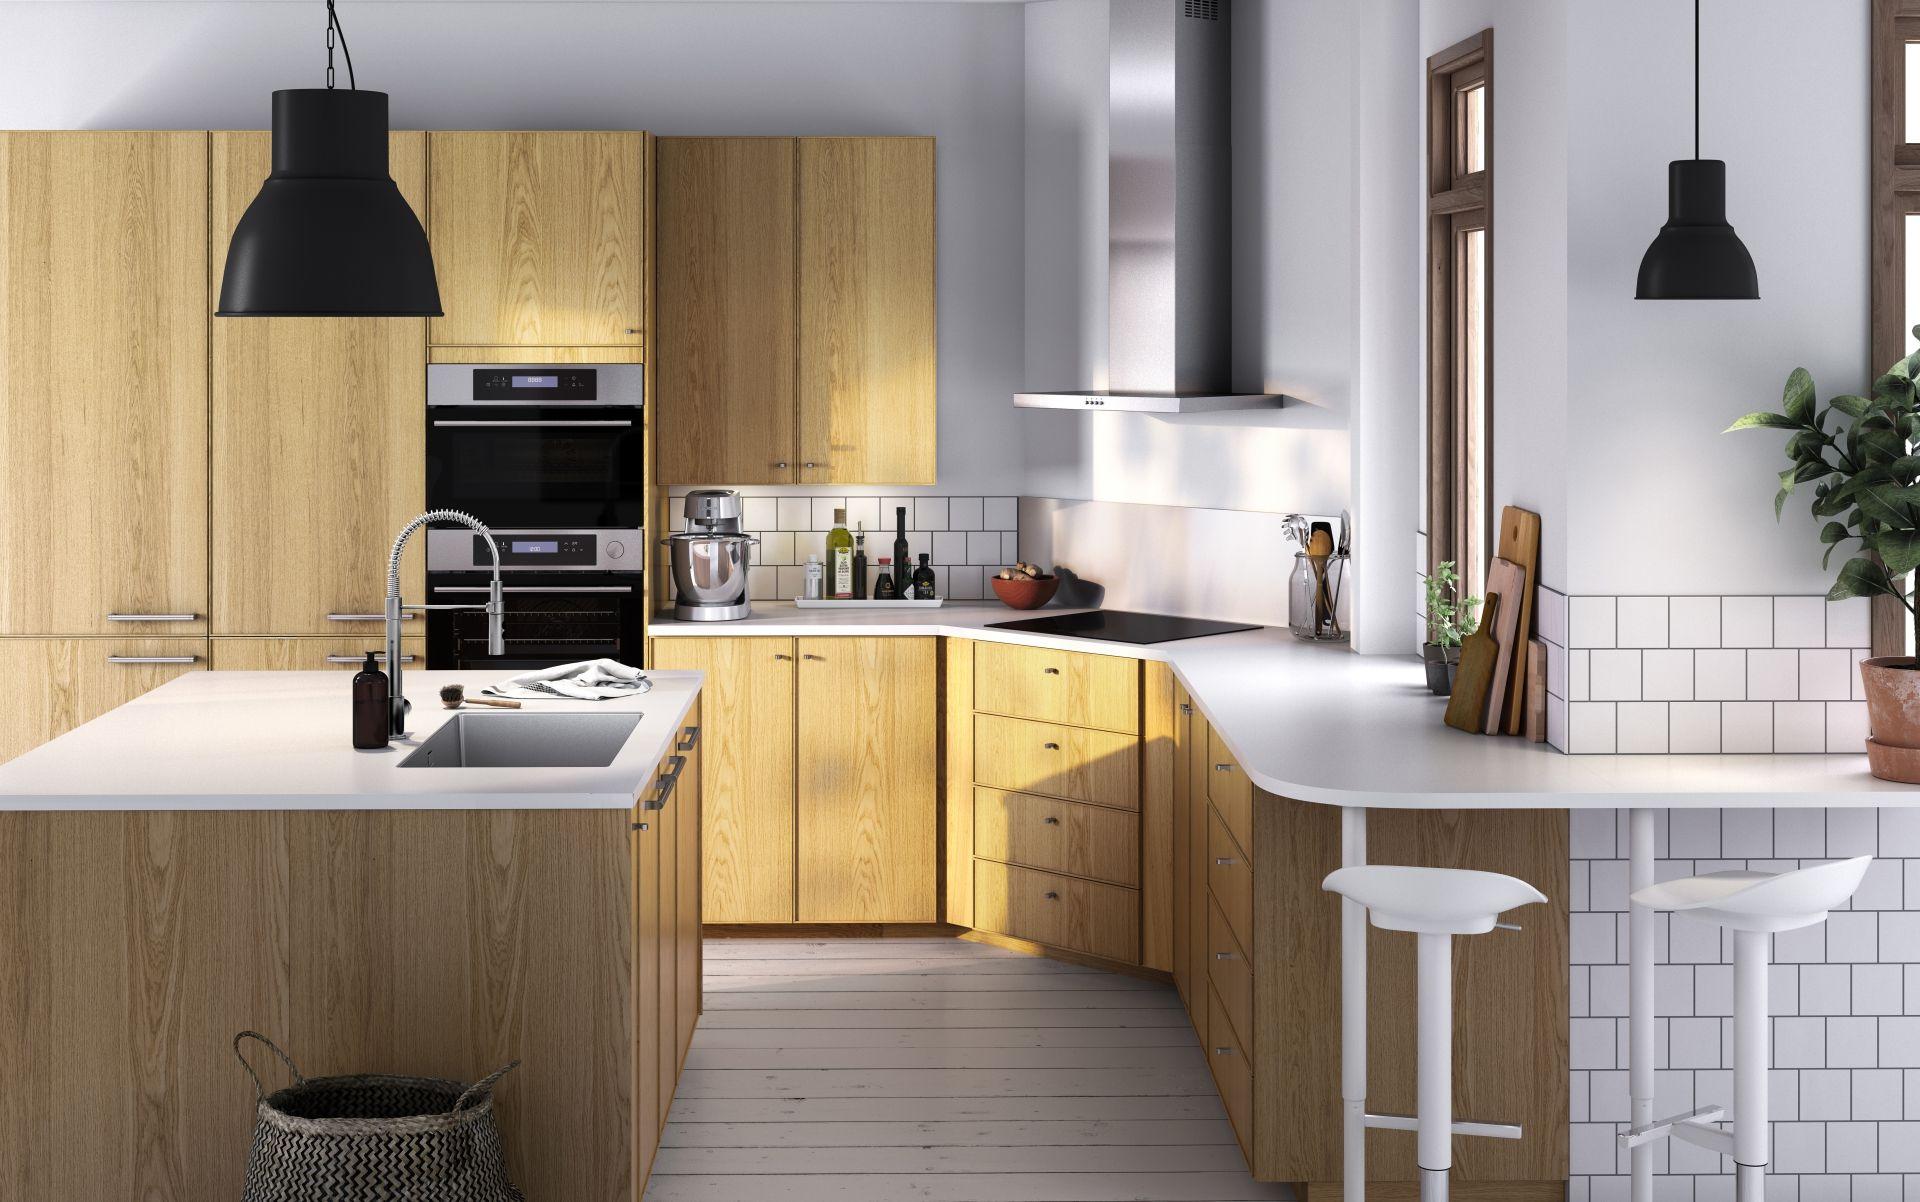 Opbergers Ikea Keuken : Metod ekestad keuken ikea ikeanl ikeanederland veelzijdig